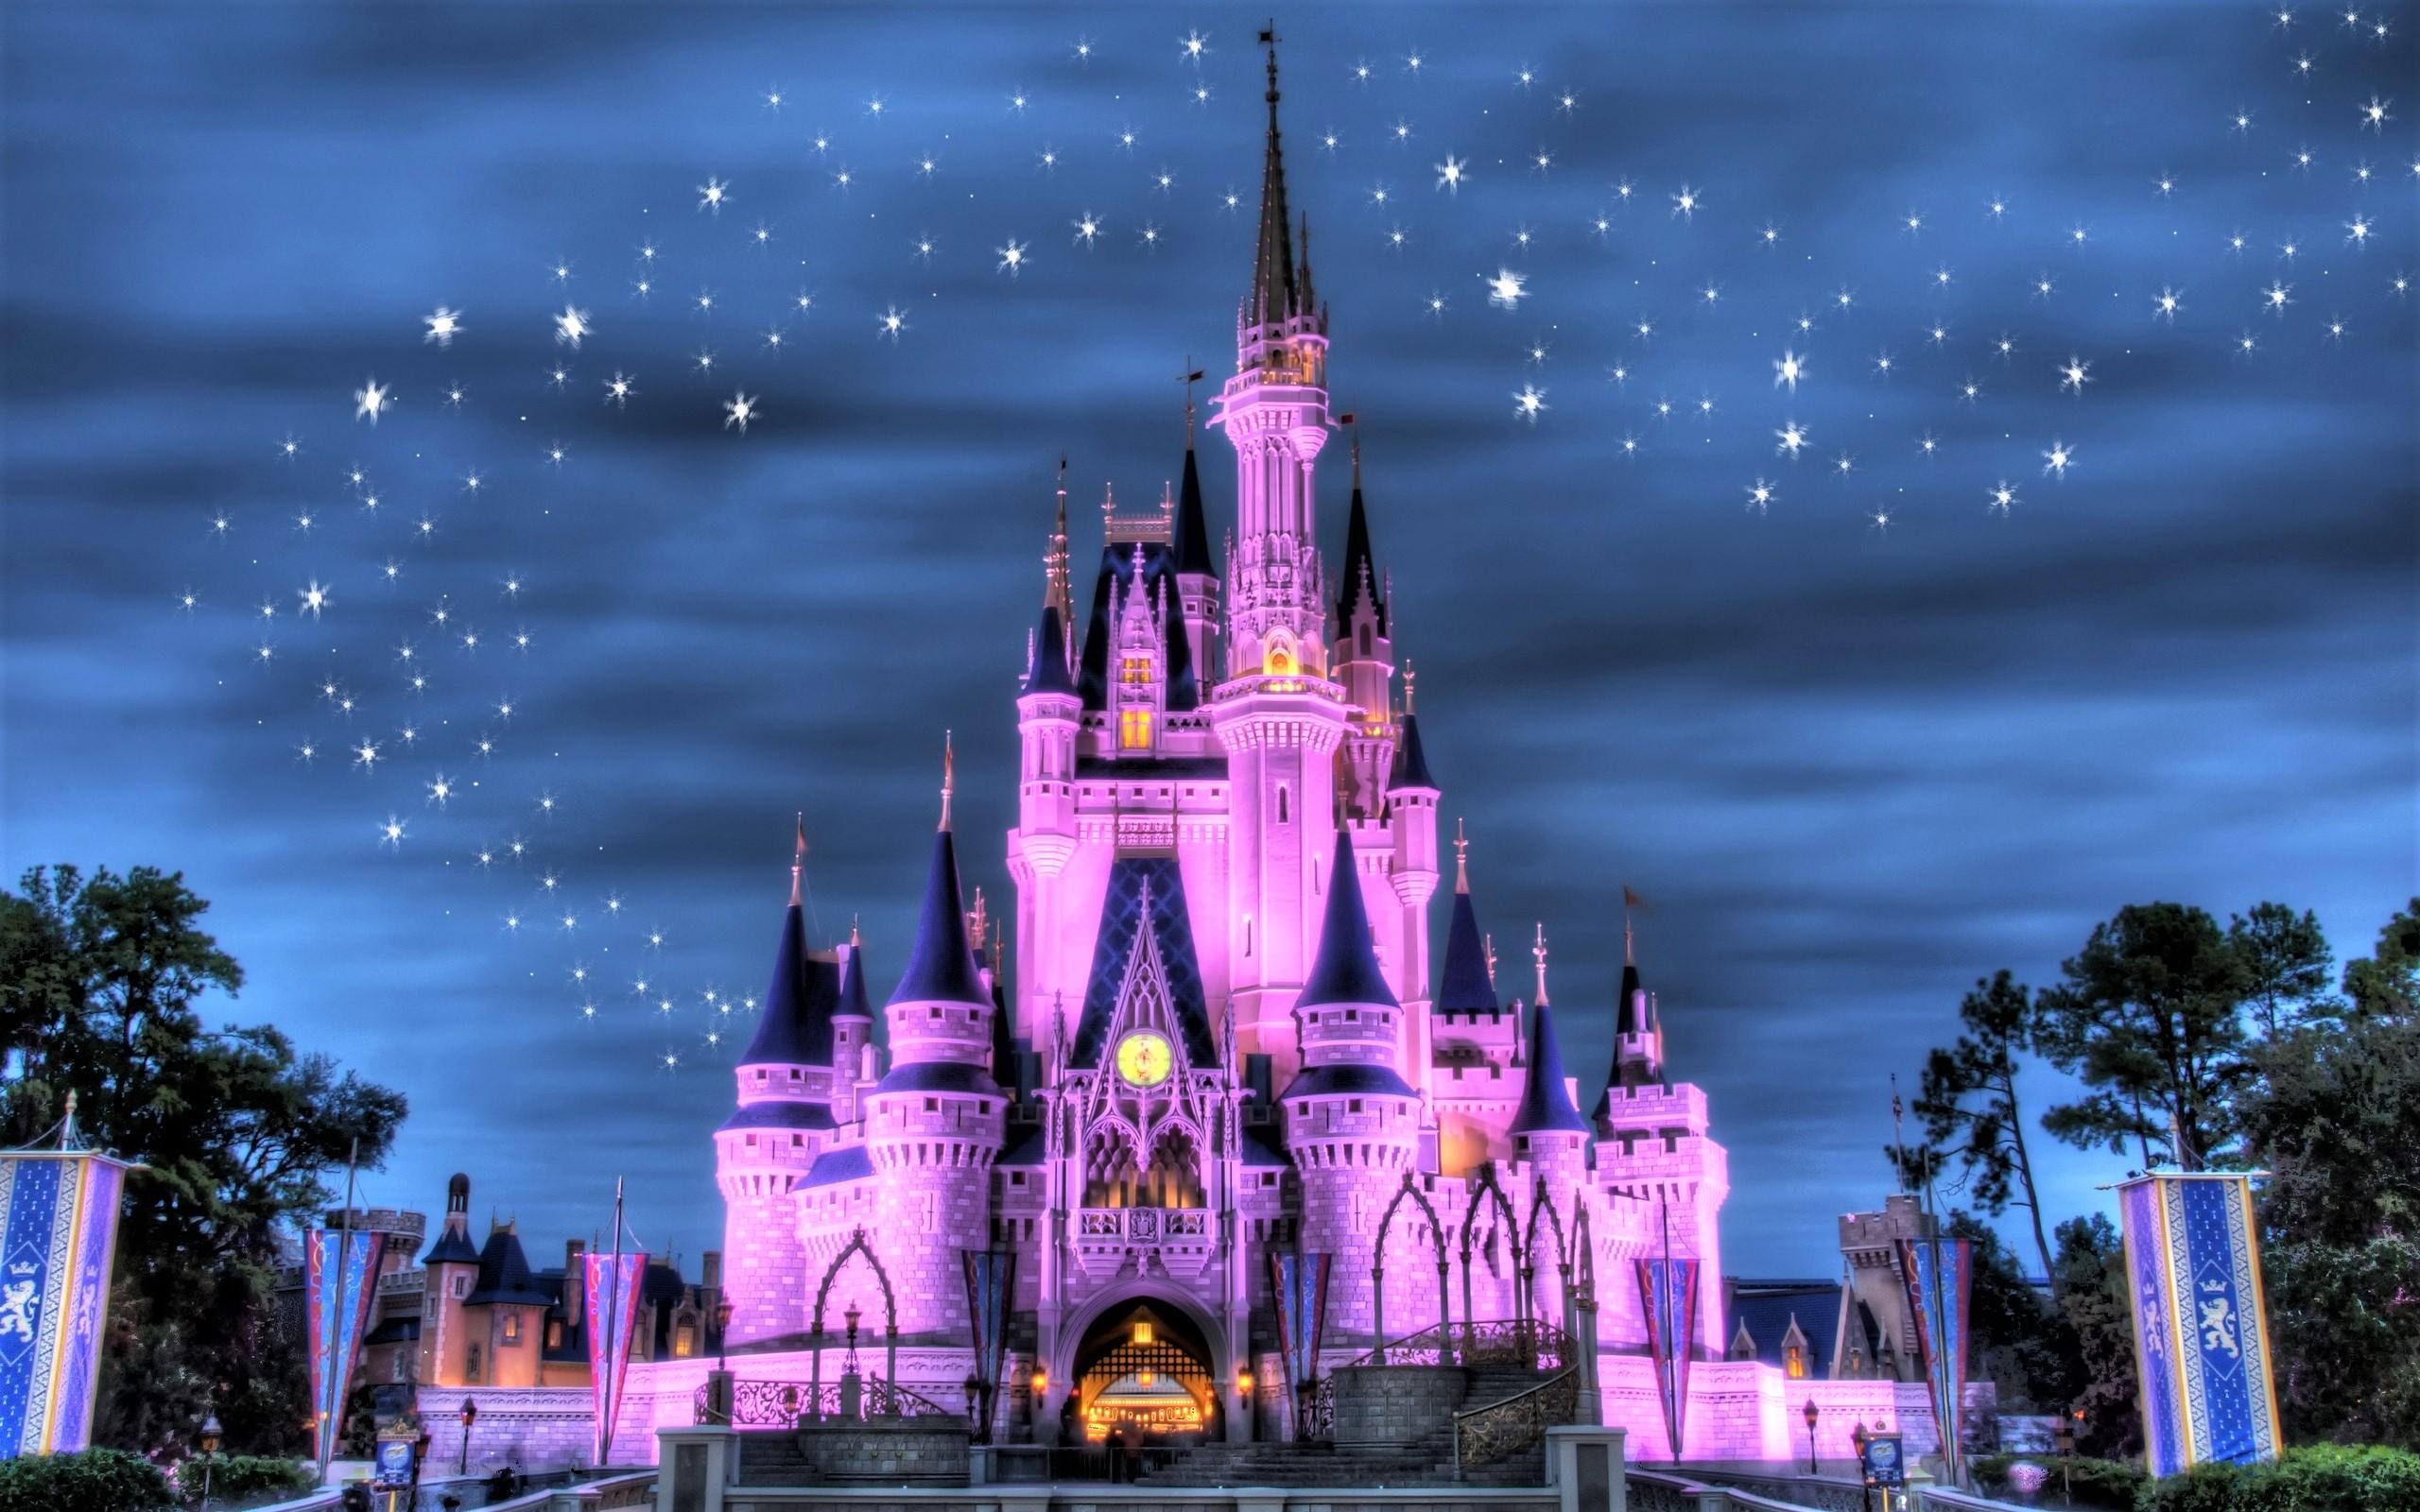 Walt Disney World Iphone Wallpaper Disneyland Castle Hd Wallpaper Background Image